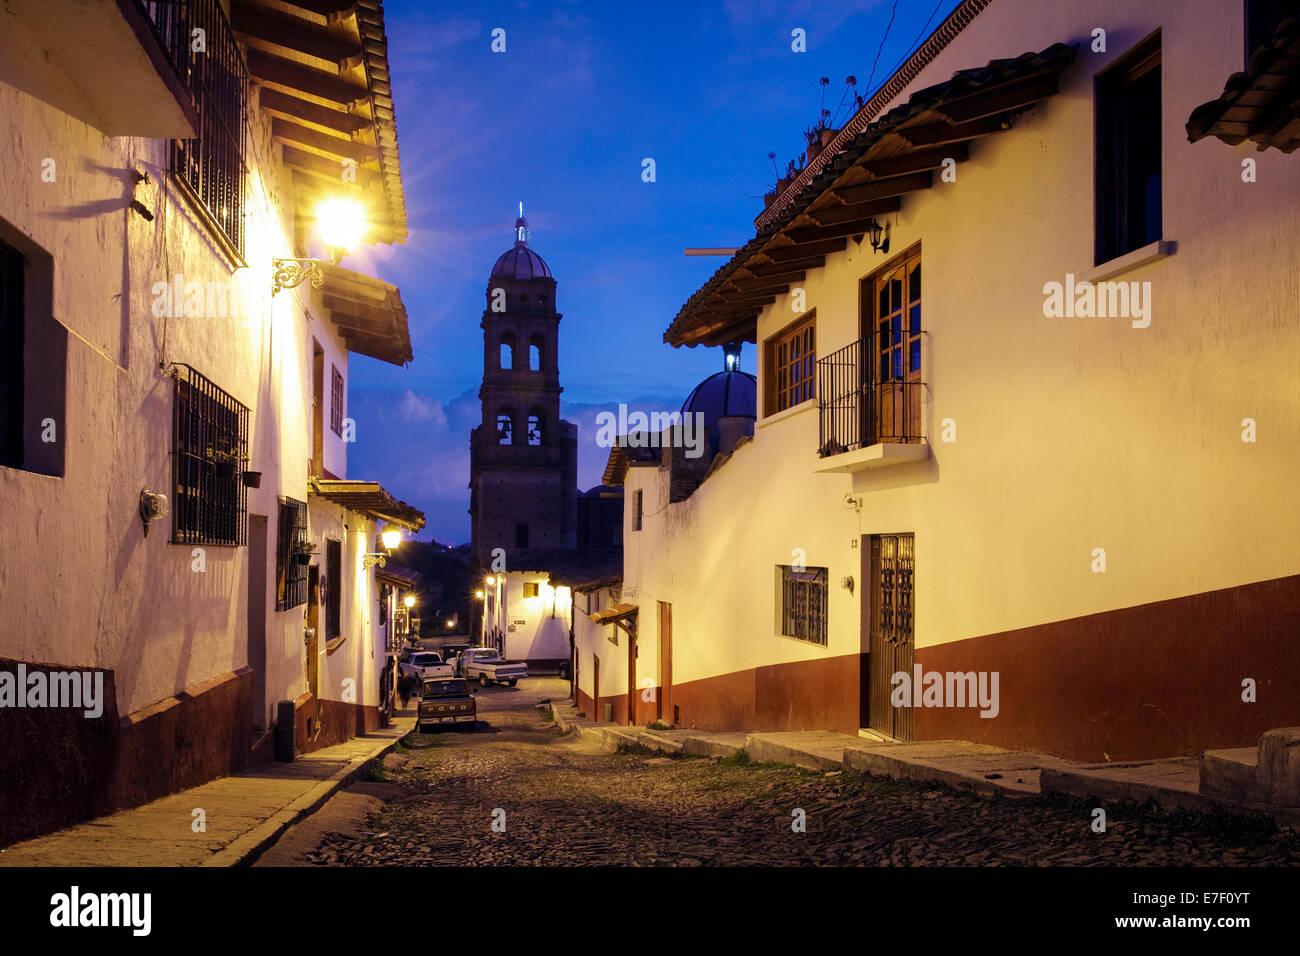 Lamplit cobblestone street of Tapalpa, Jalisco, Mexico at twilight. - Stock Image